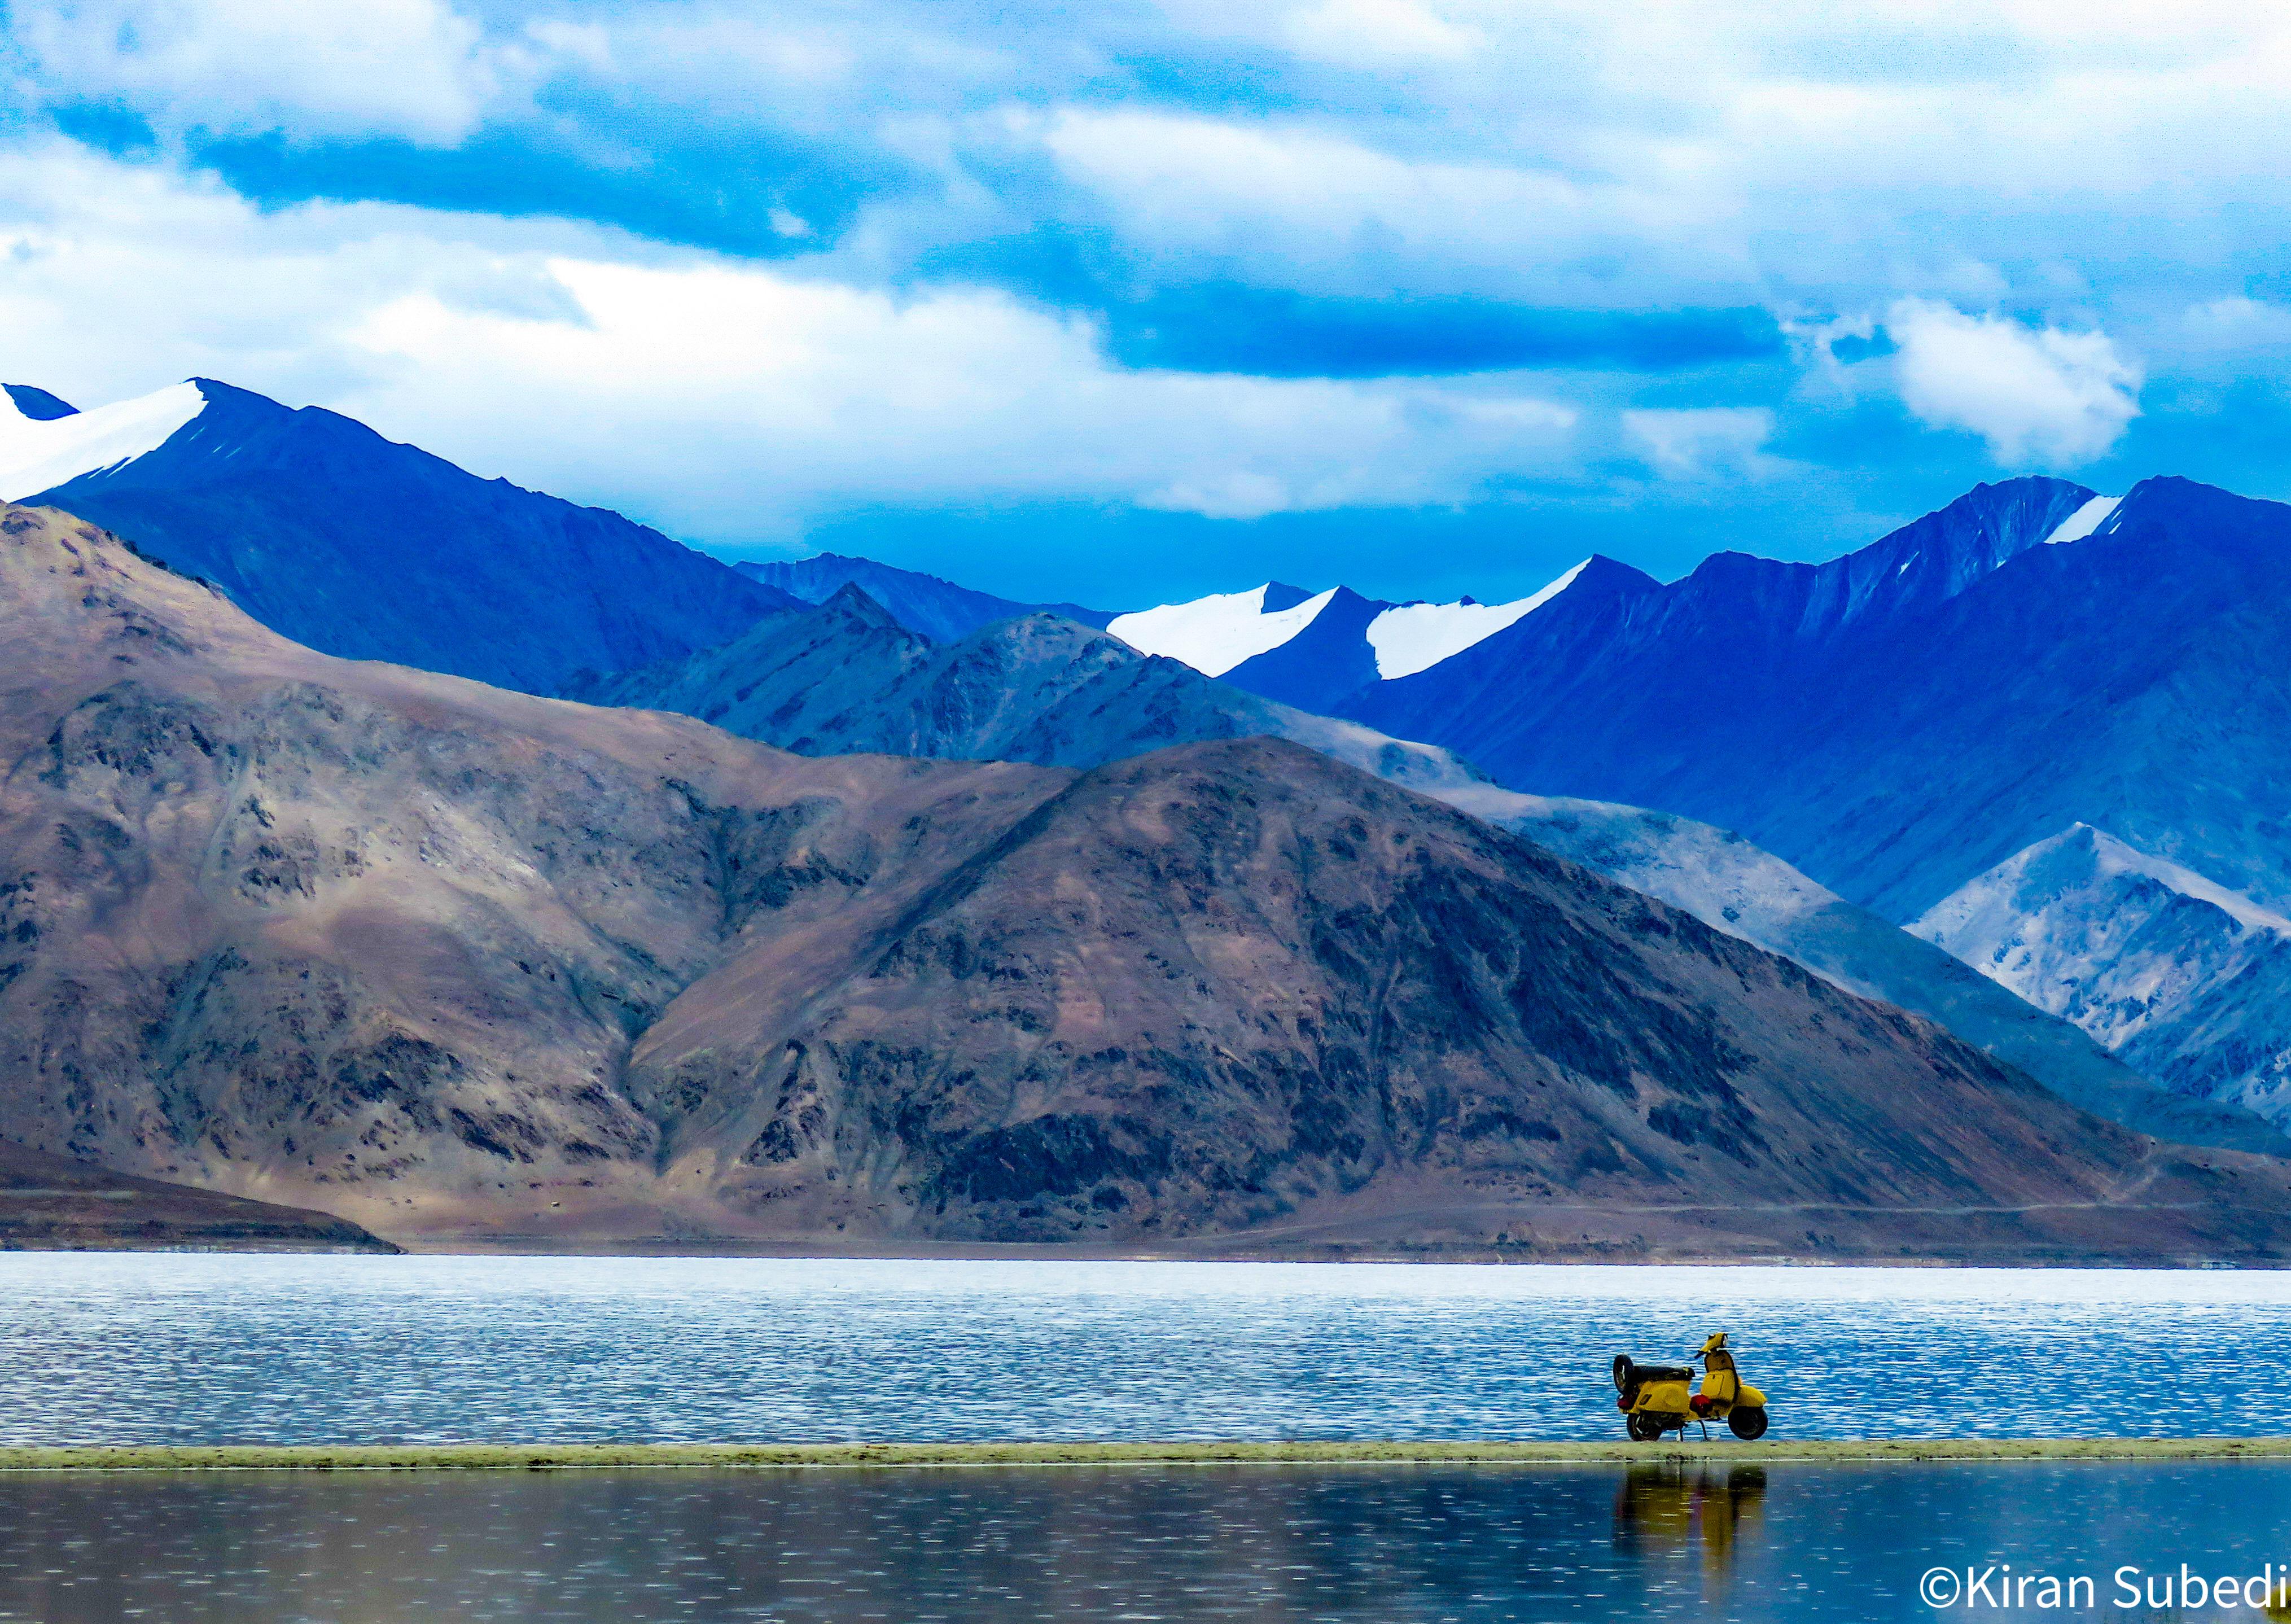 Pangong Tso is the most famous lake in Ladakh.